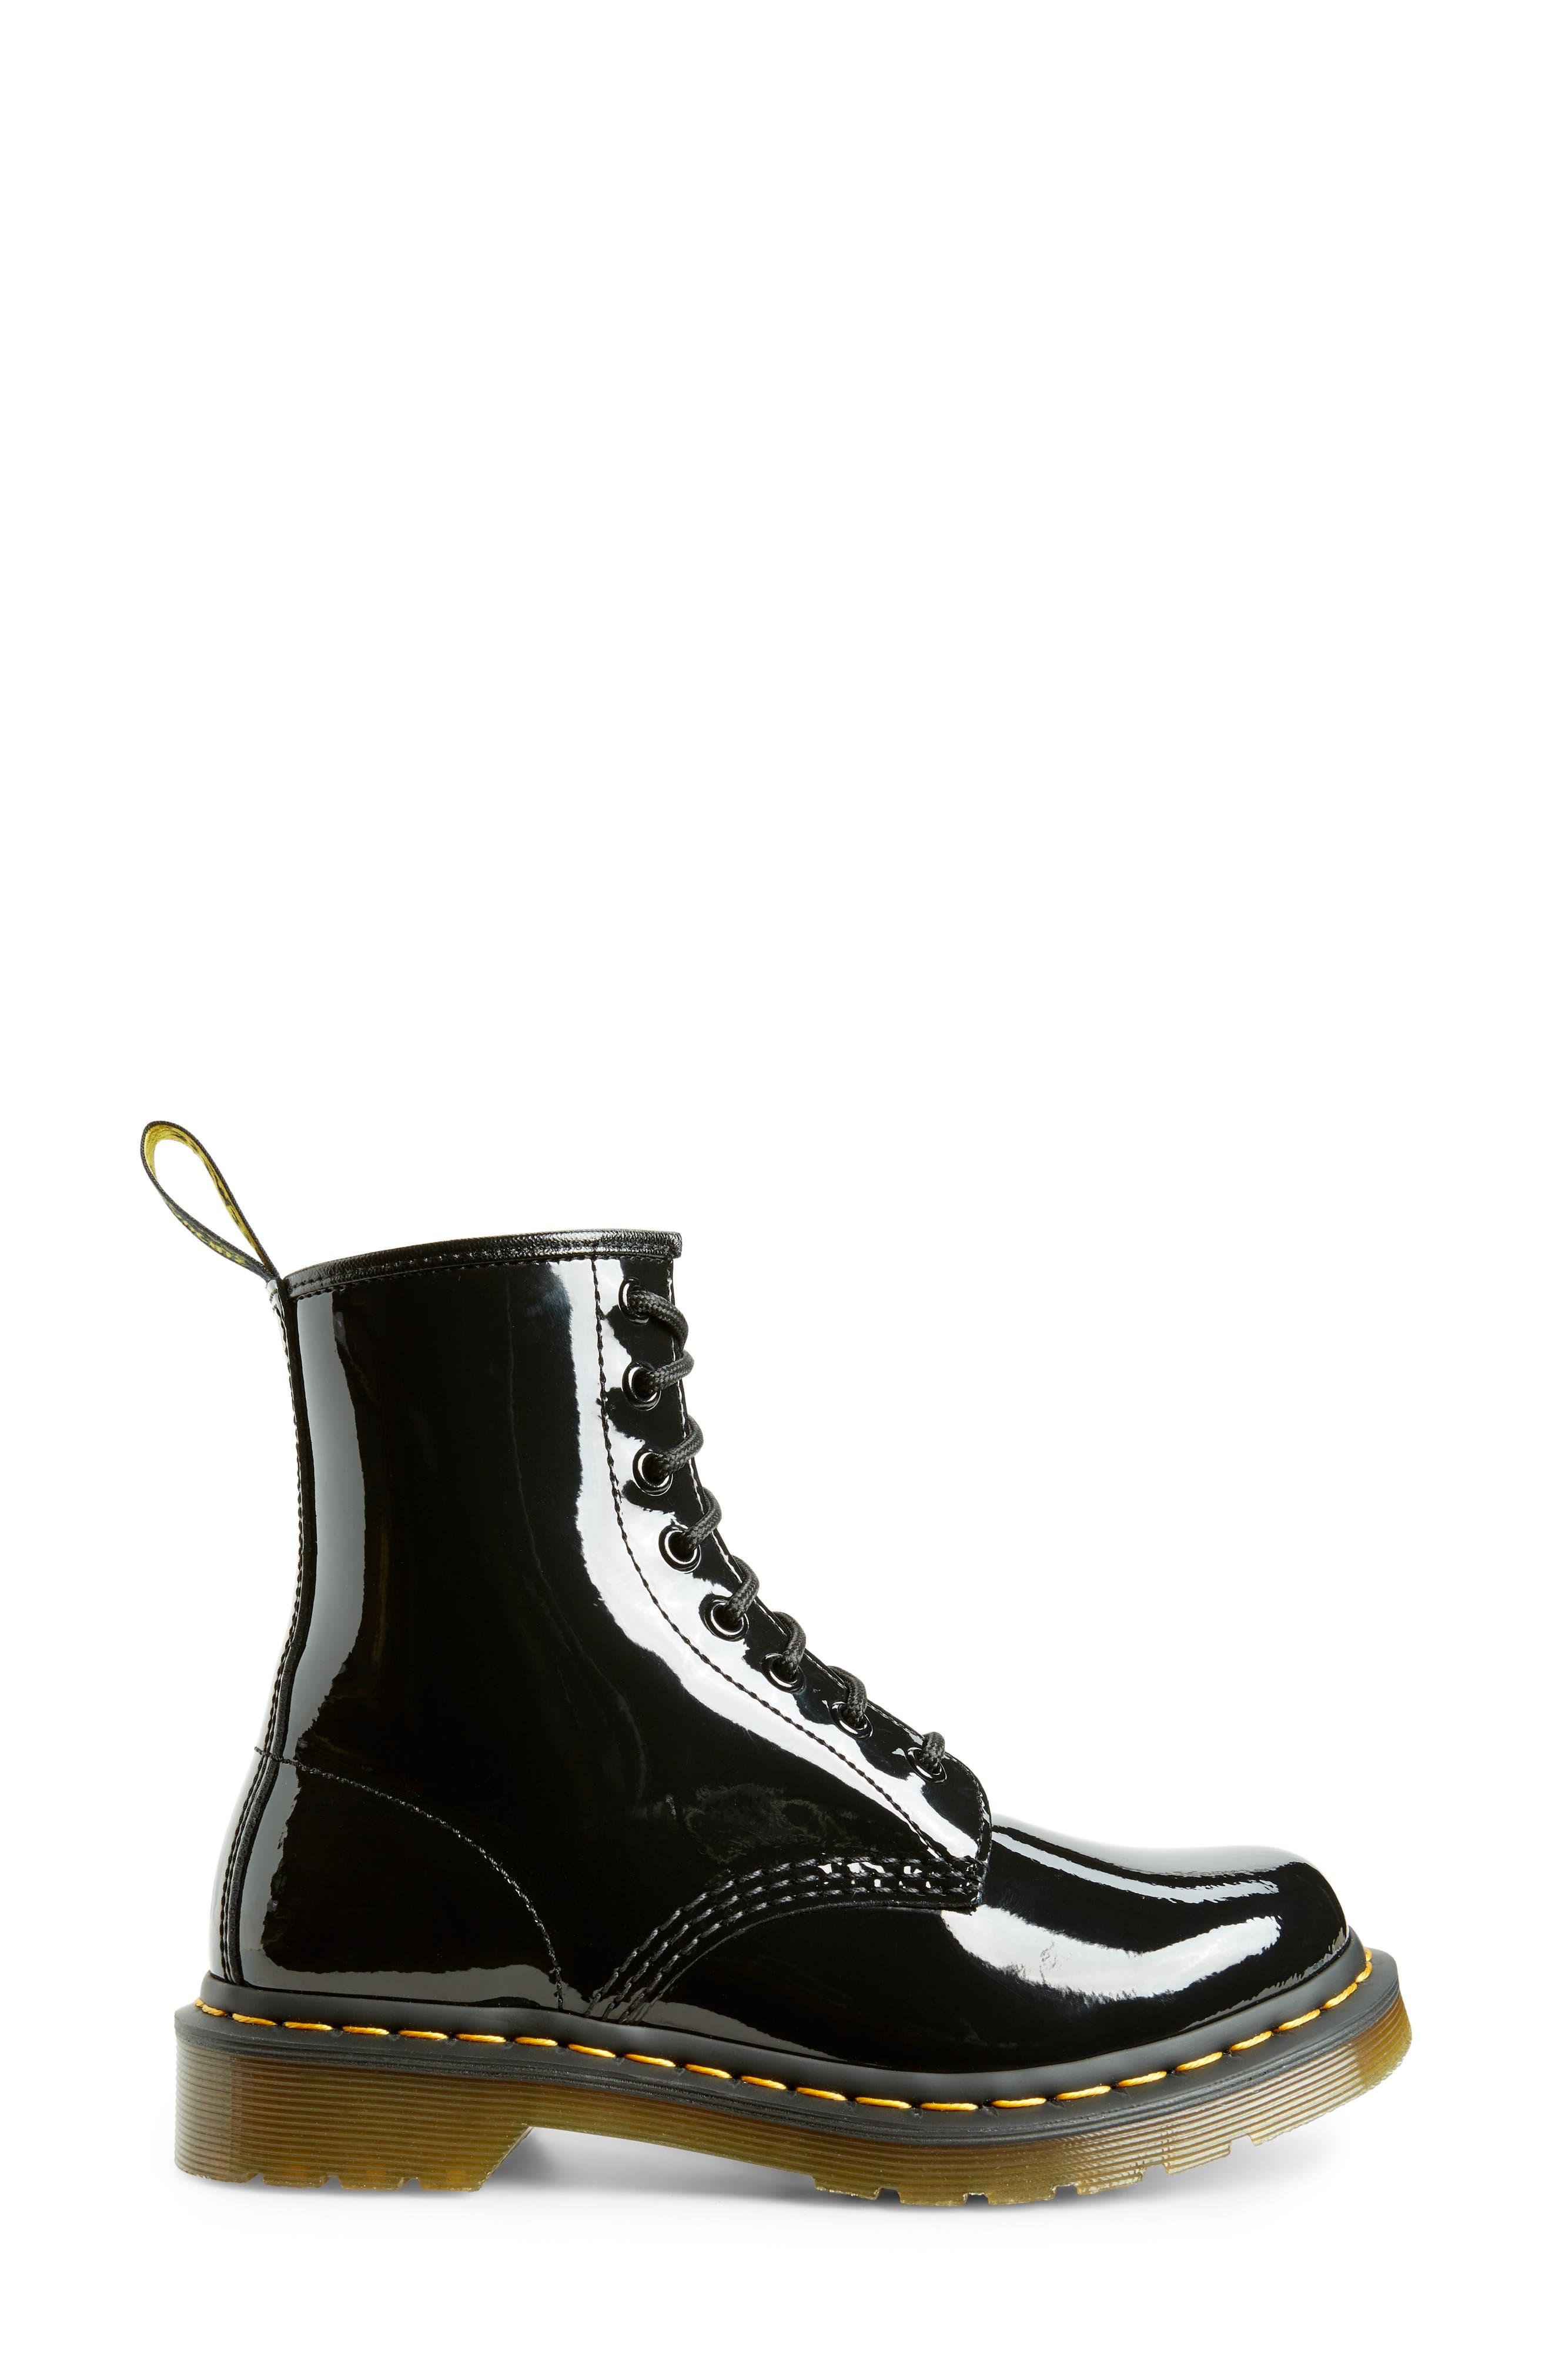 '1460' Boot,                             Alternate thumbnail 3, color,                             011